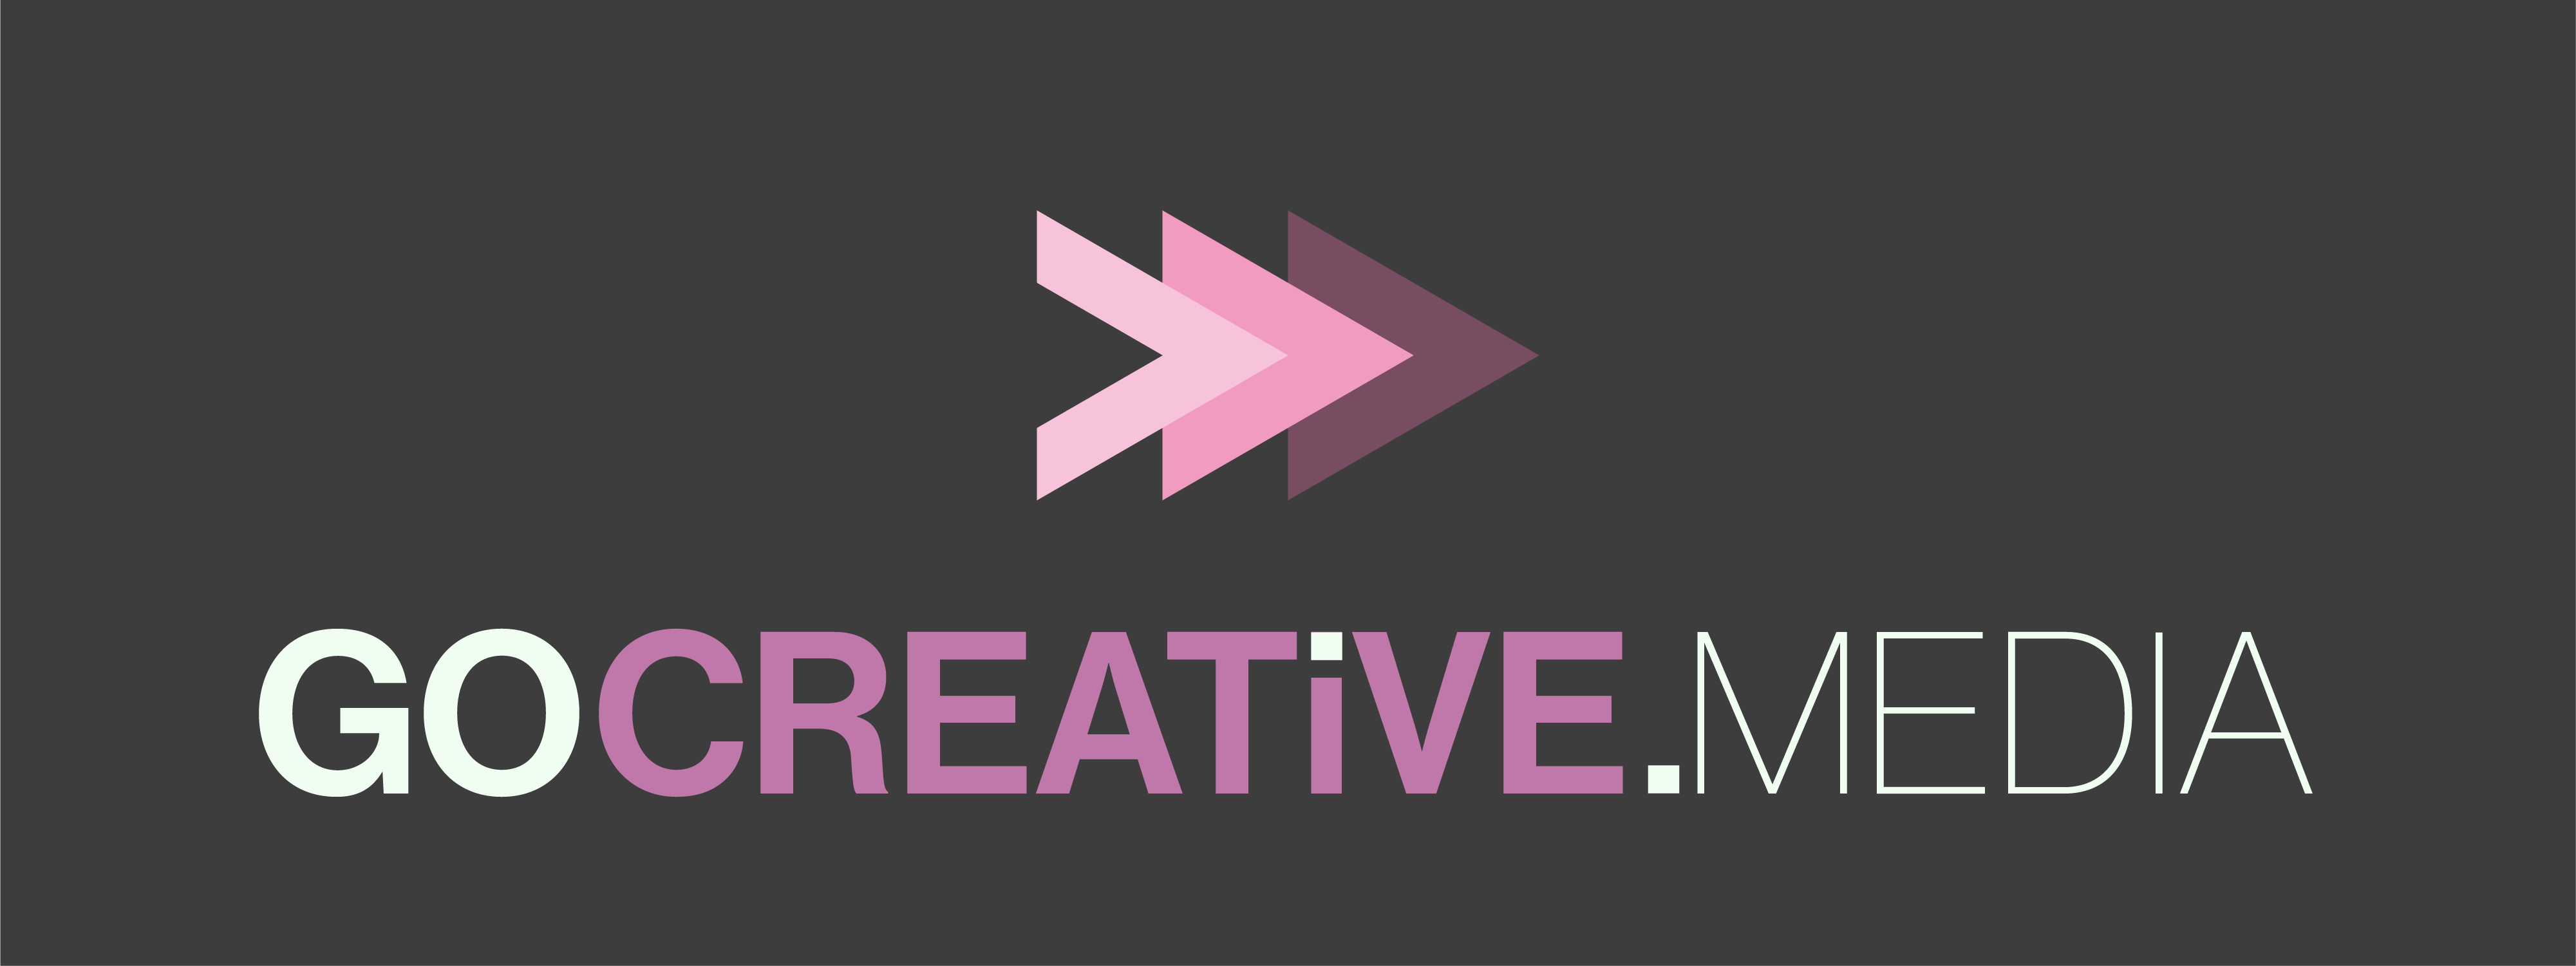 Go Creative Media